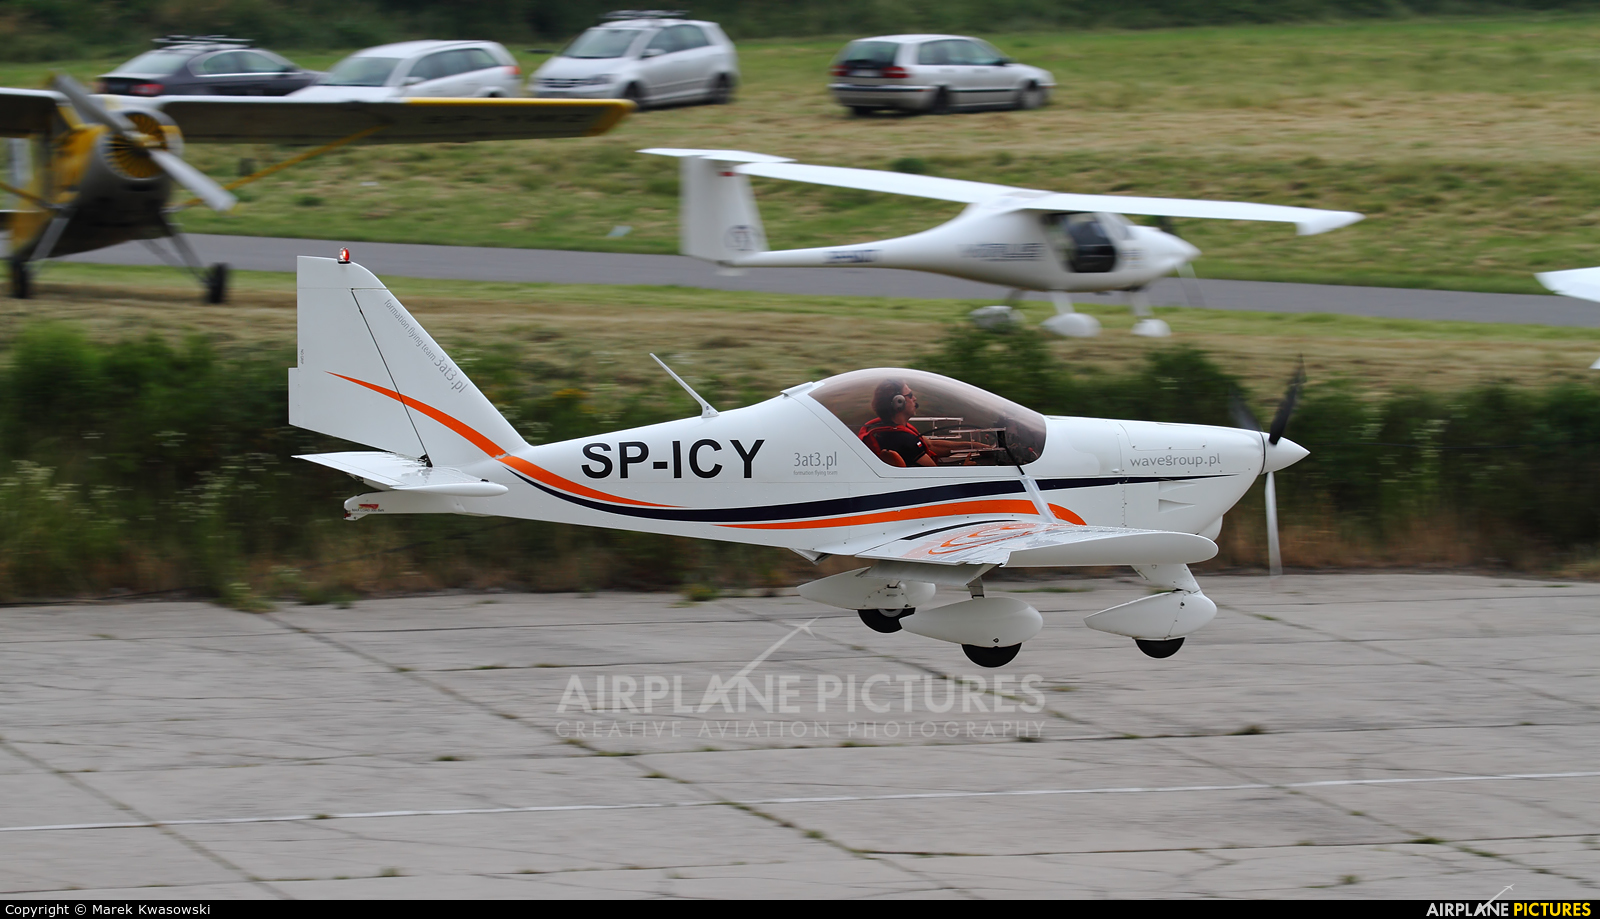 3AT3 Formation Flying Team SP-ICY aircraft at Kraków, Rakowice Czyżyny - Museum of Polish Aviation